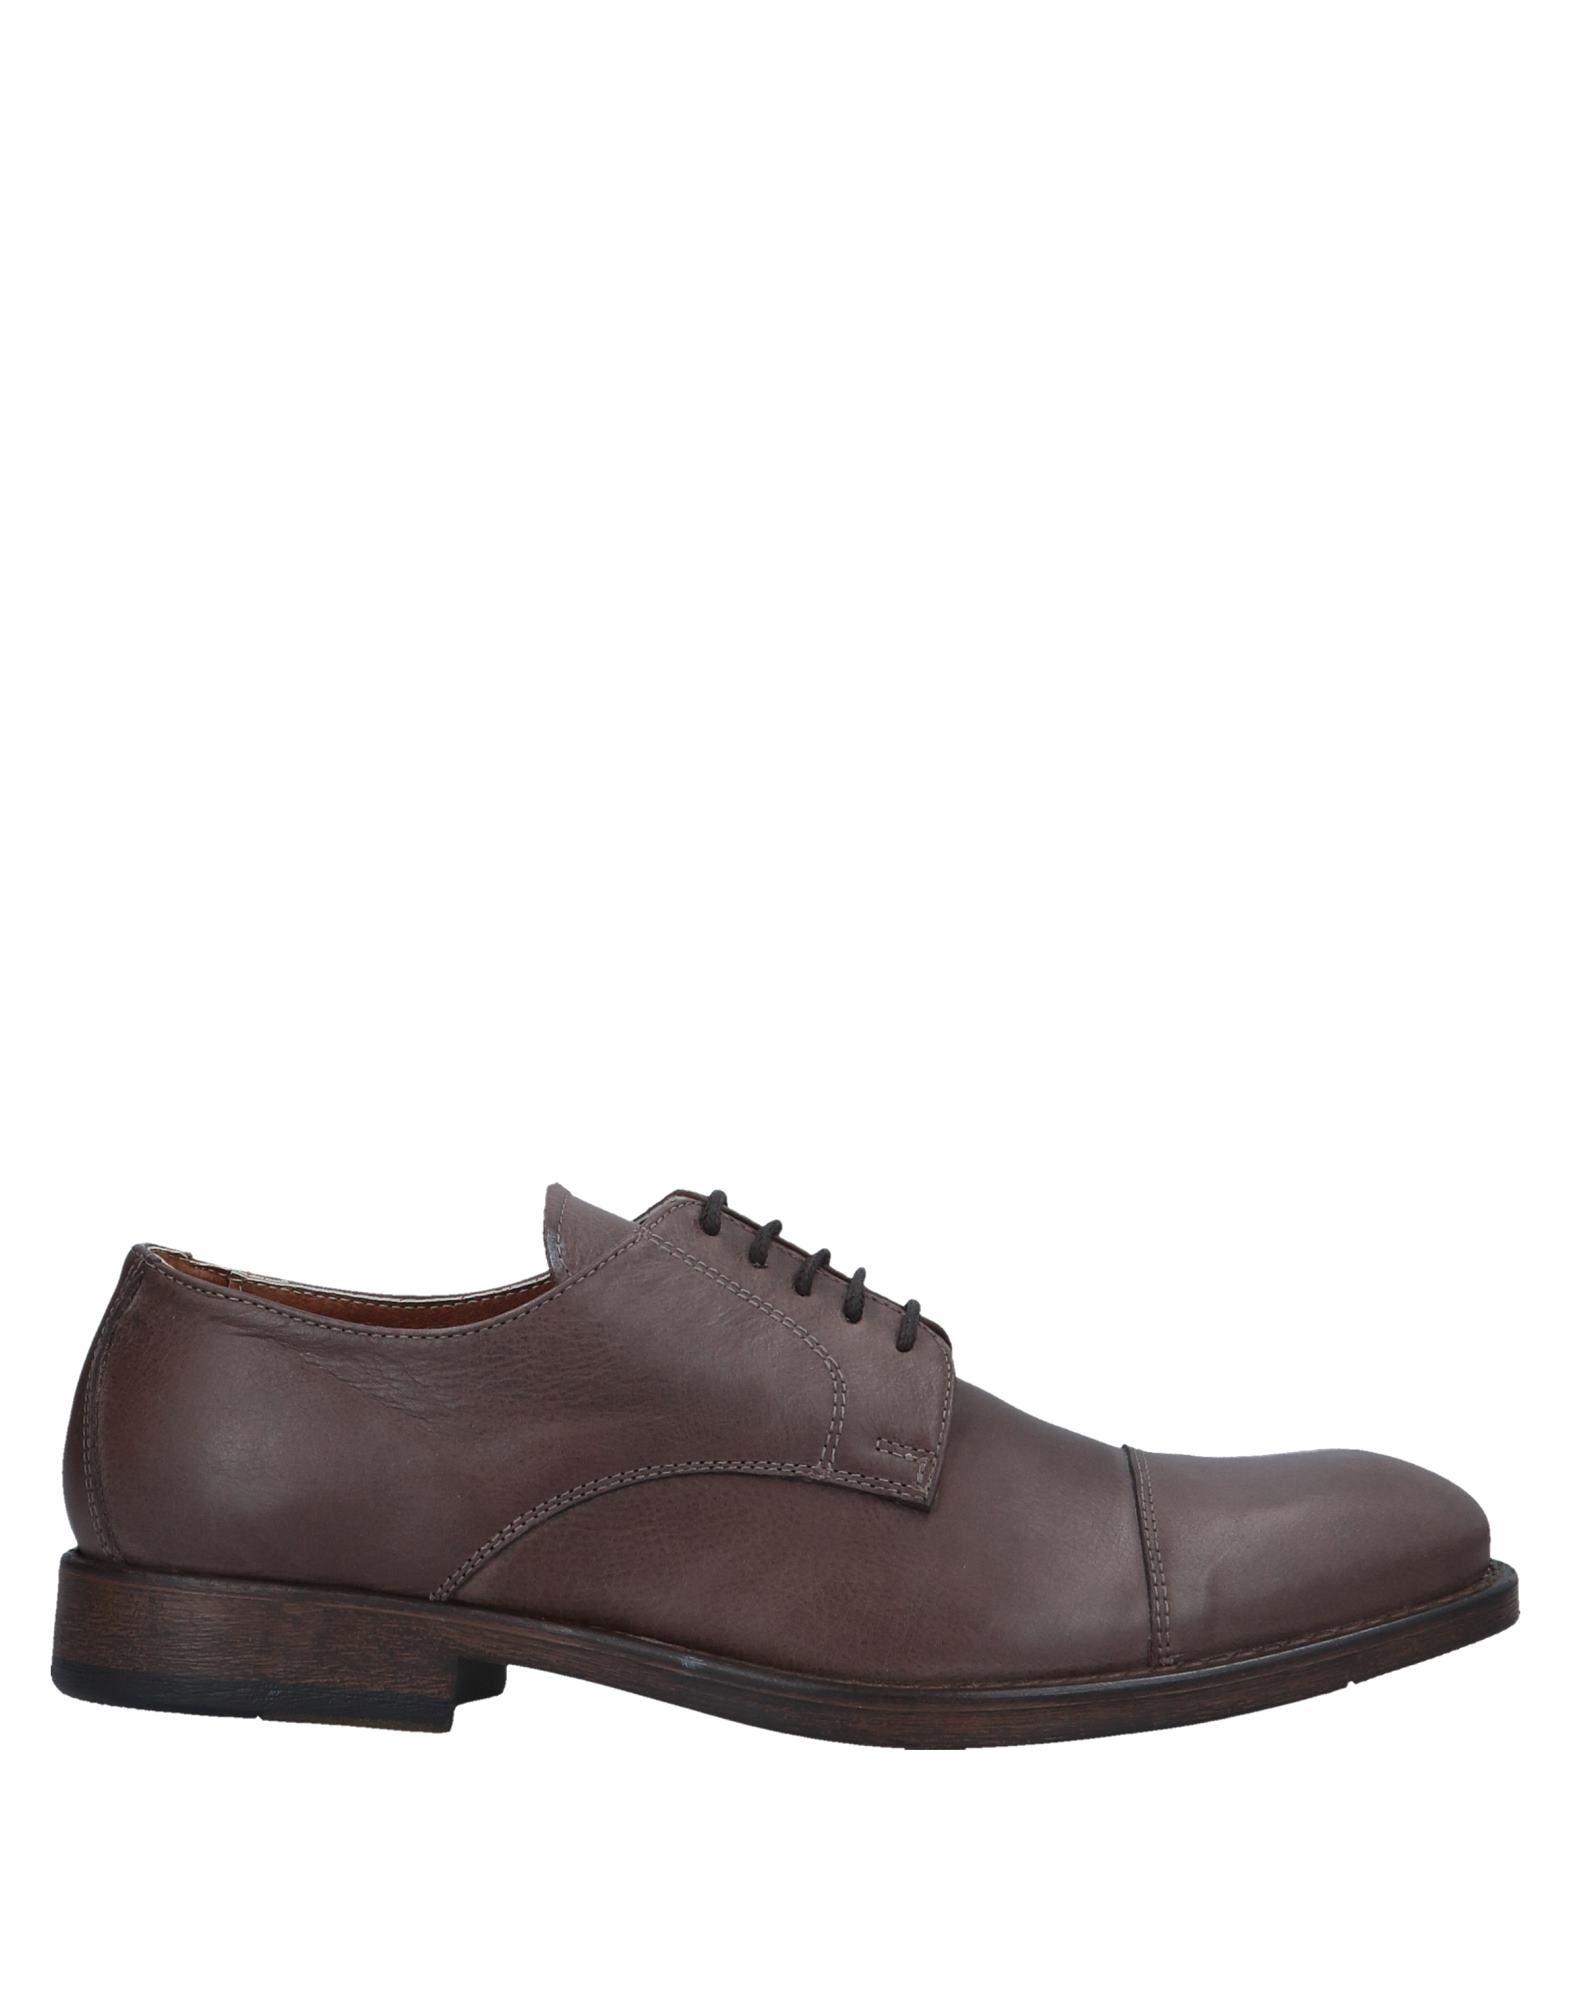 Фото - TSD12 Обувь на шнурках обувь на высокой платформе dkny